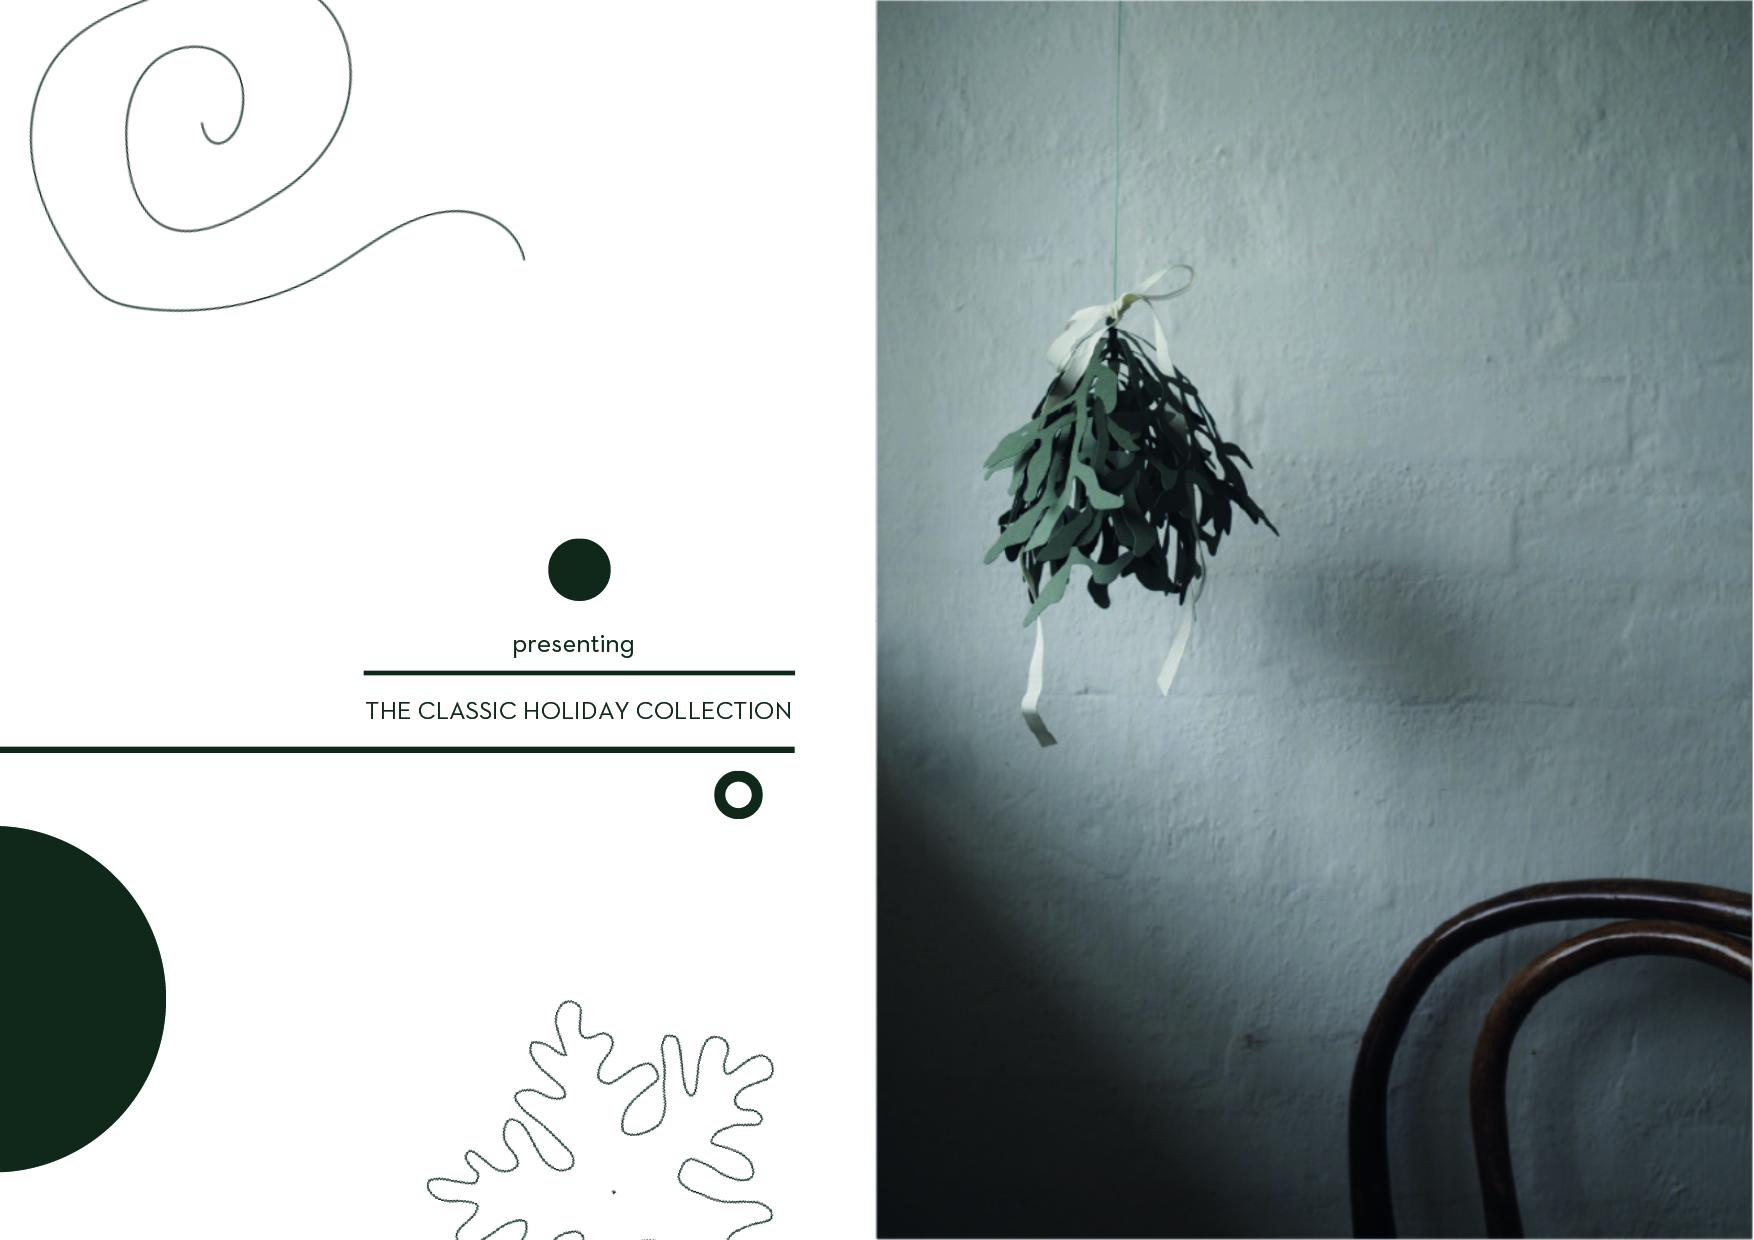 katalog side6.jpg